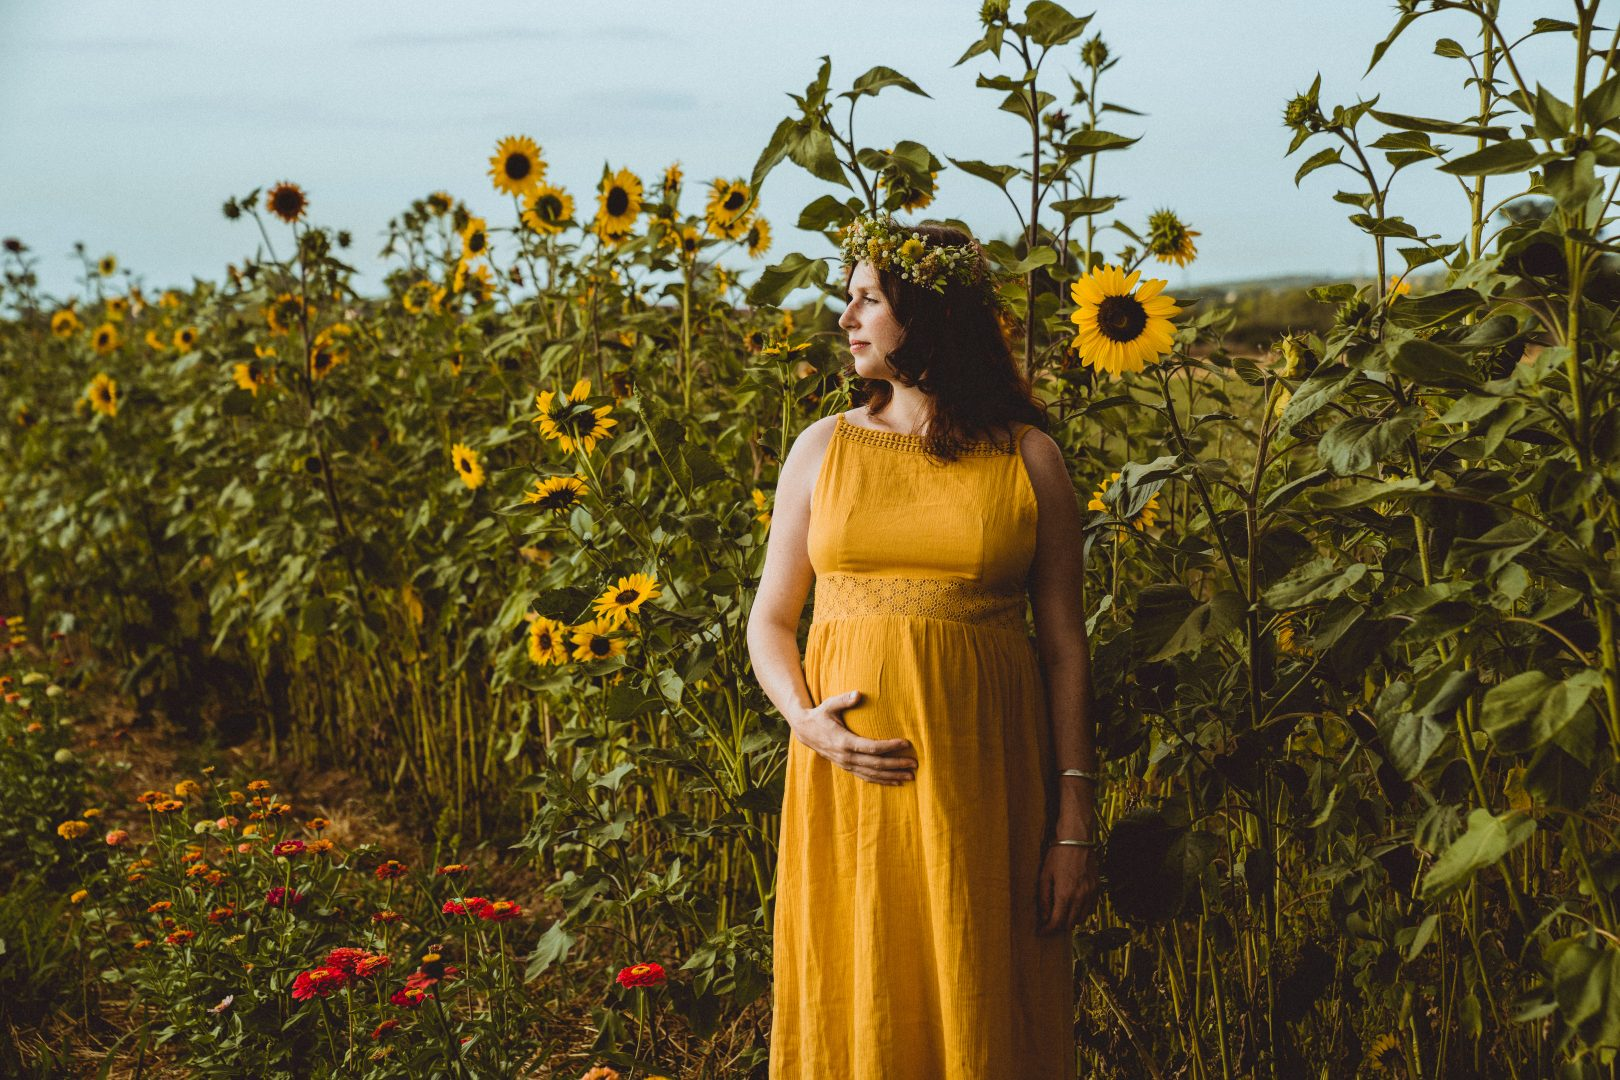 Schwangere steht vor Sonnenblumenfeld